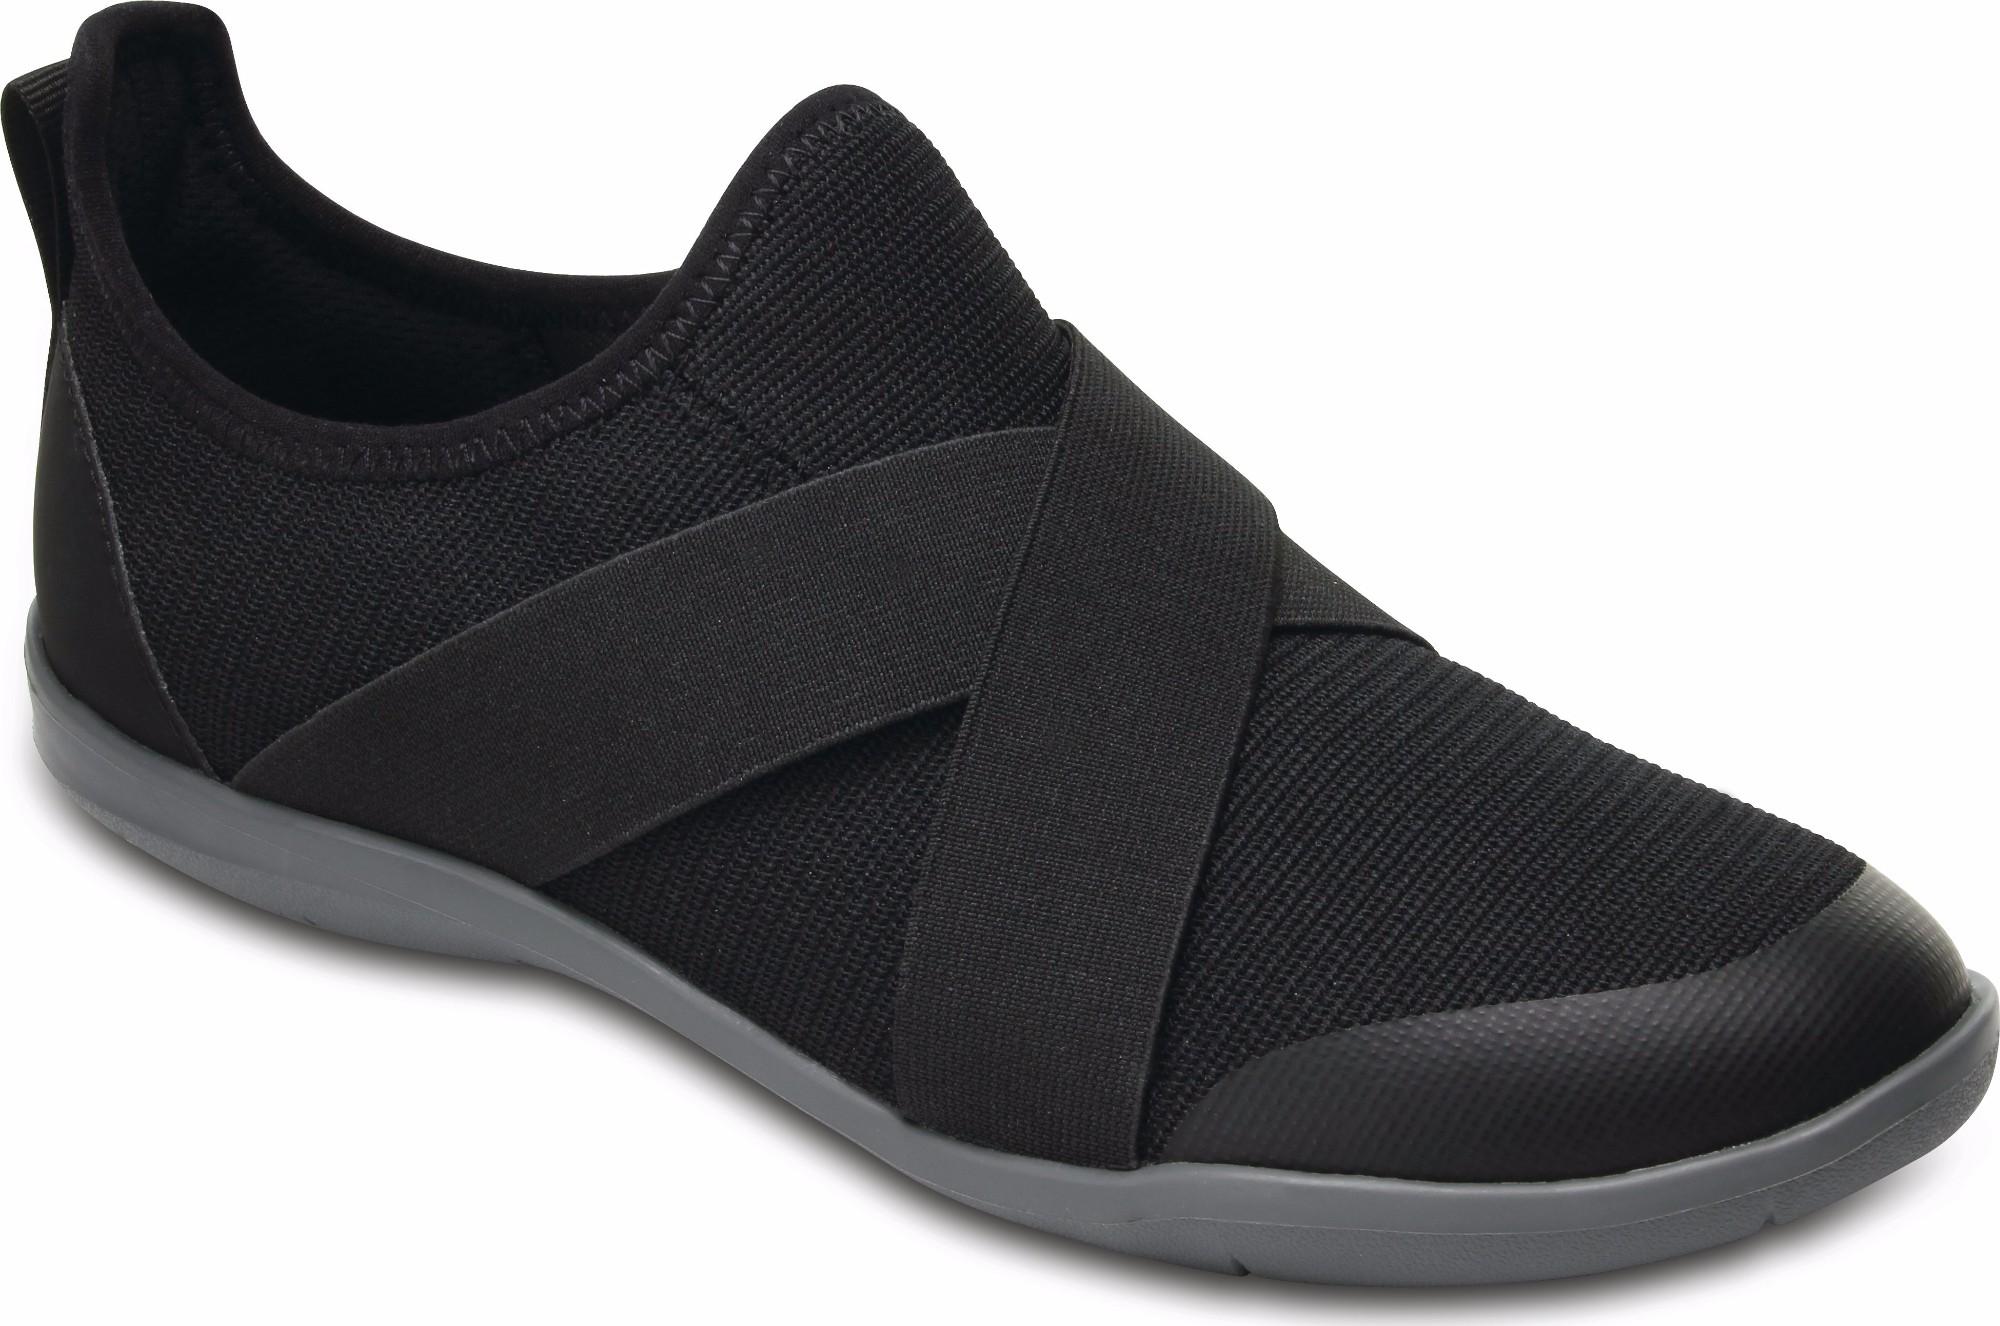 Frauen Swiftwater Cross-Strap Static Clog Schuhe, EUR: 38.5, Black Crocs